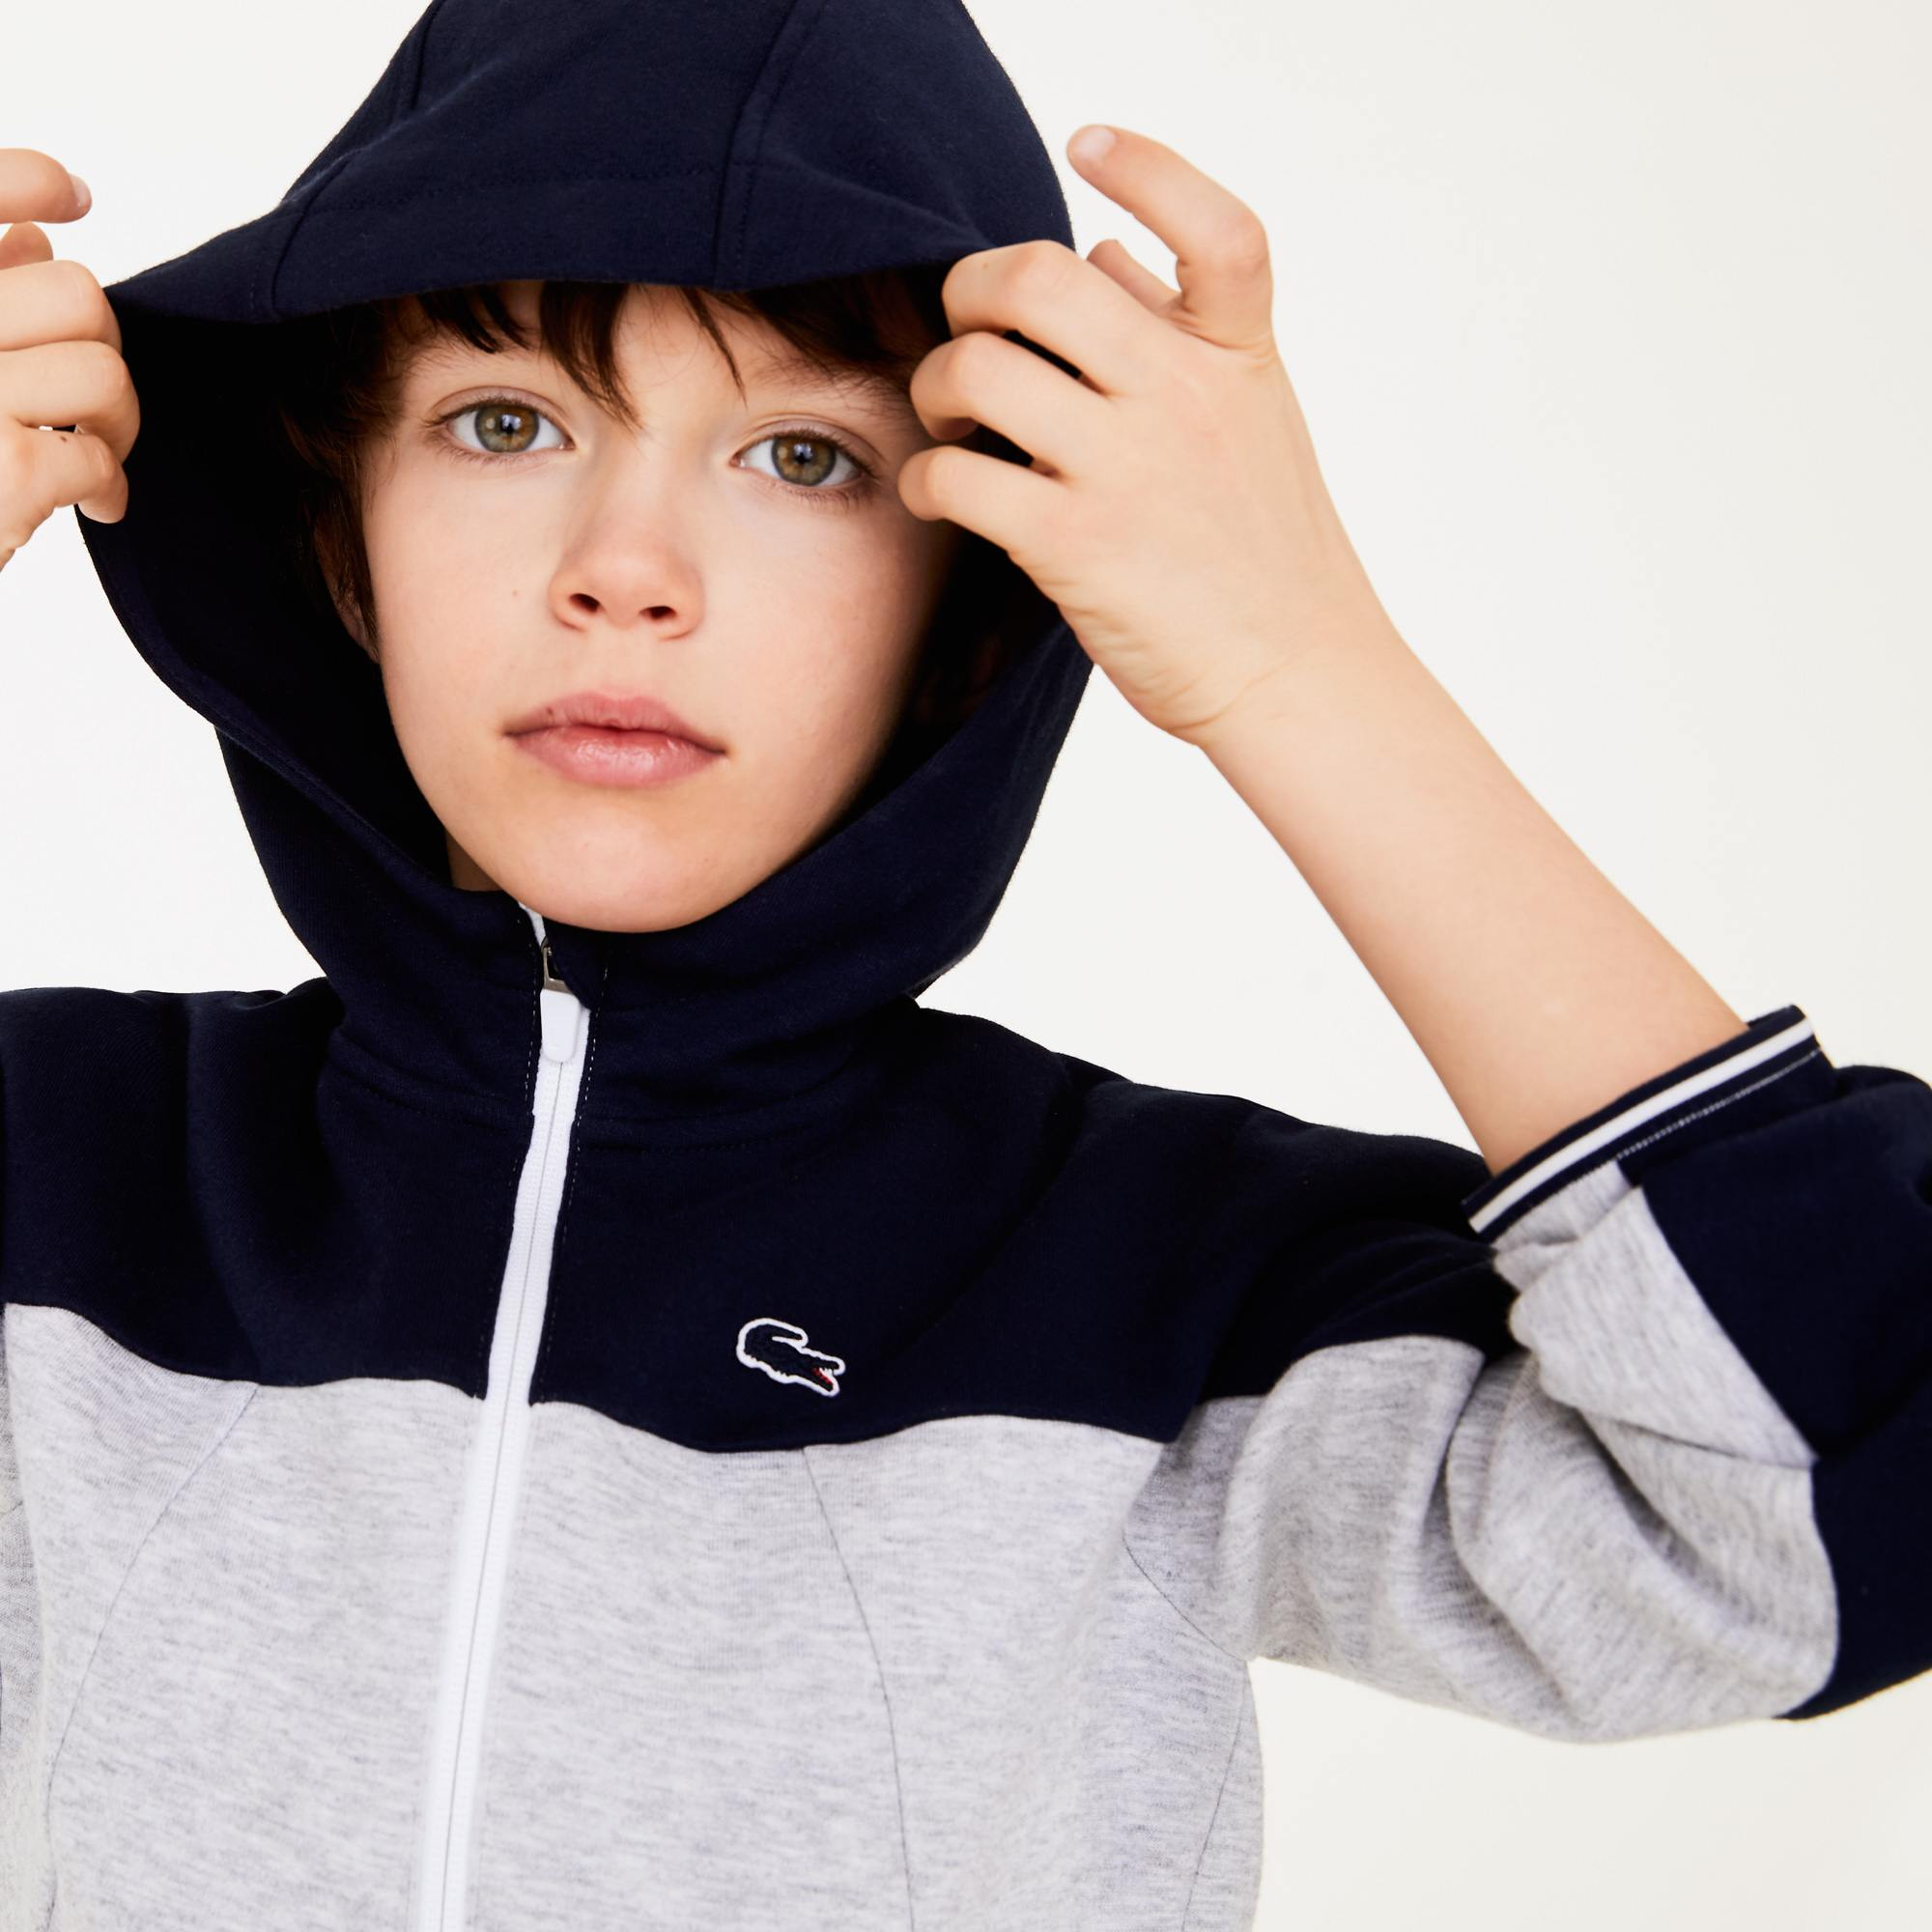 34d2ceb1b5 Boy's Knitwear & Sweatshirts | Kids Fashion | LACOSTE